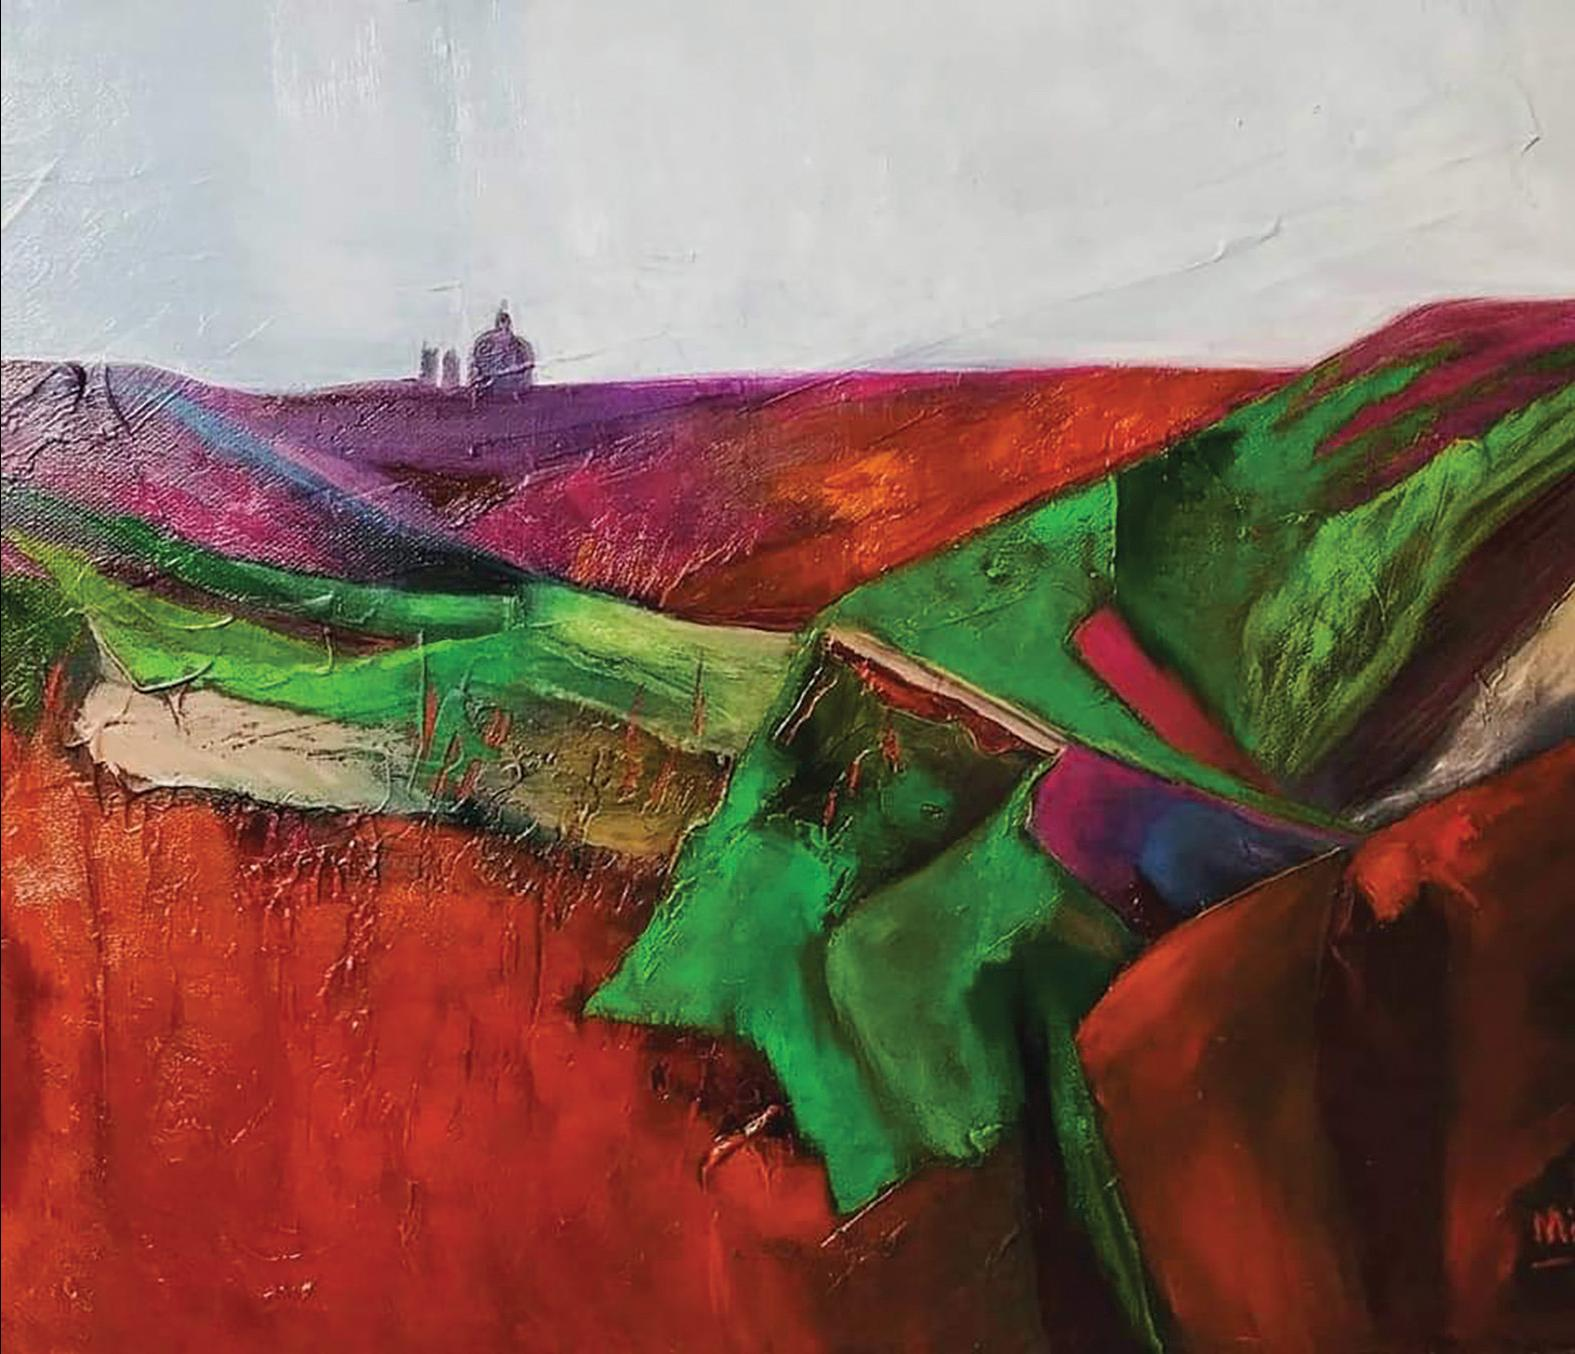 Village Solitude from the Village Sonata collection